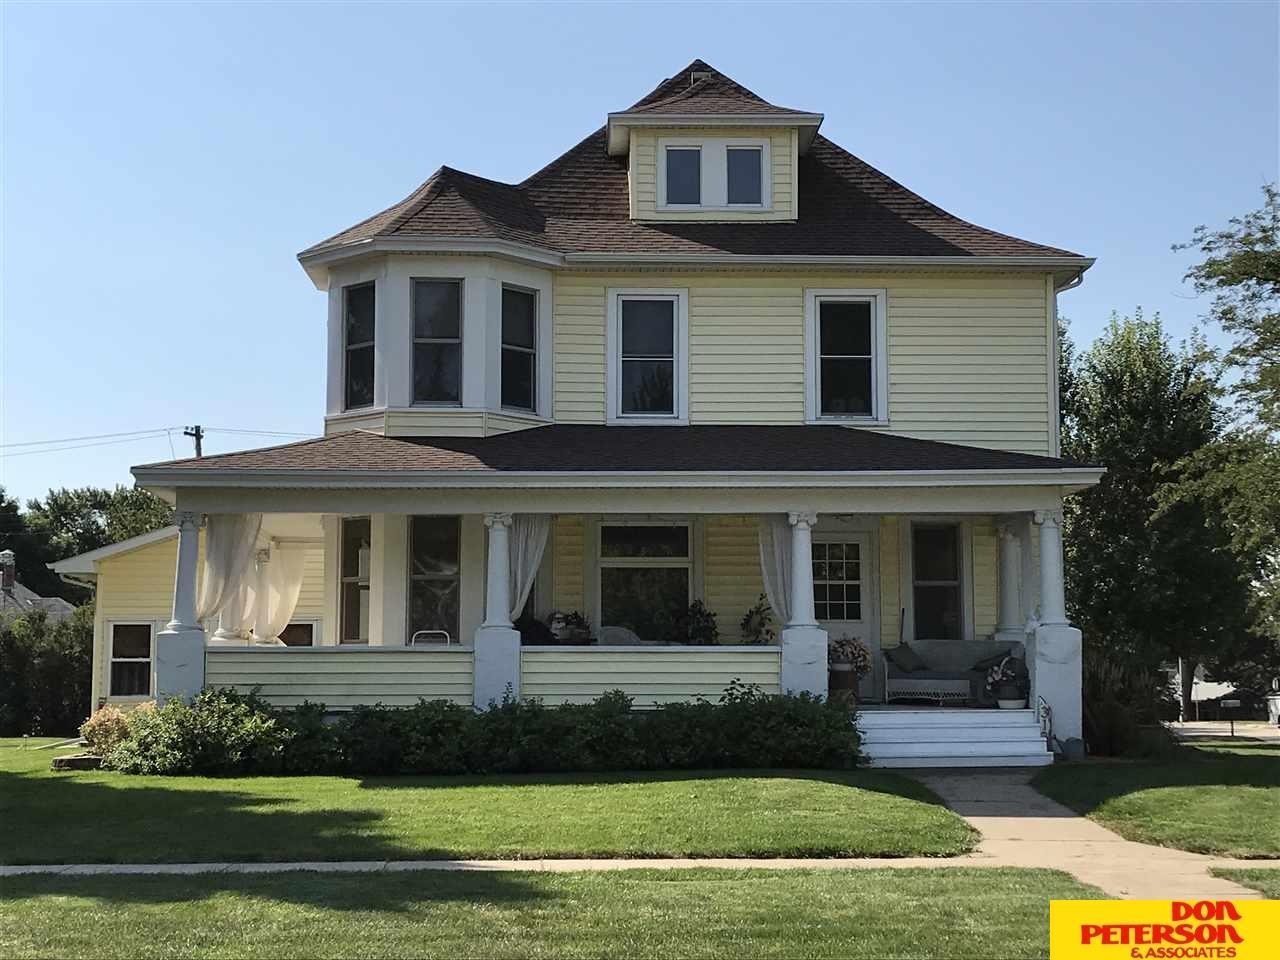 313 W Main Street Hartington, NE 68739